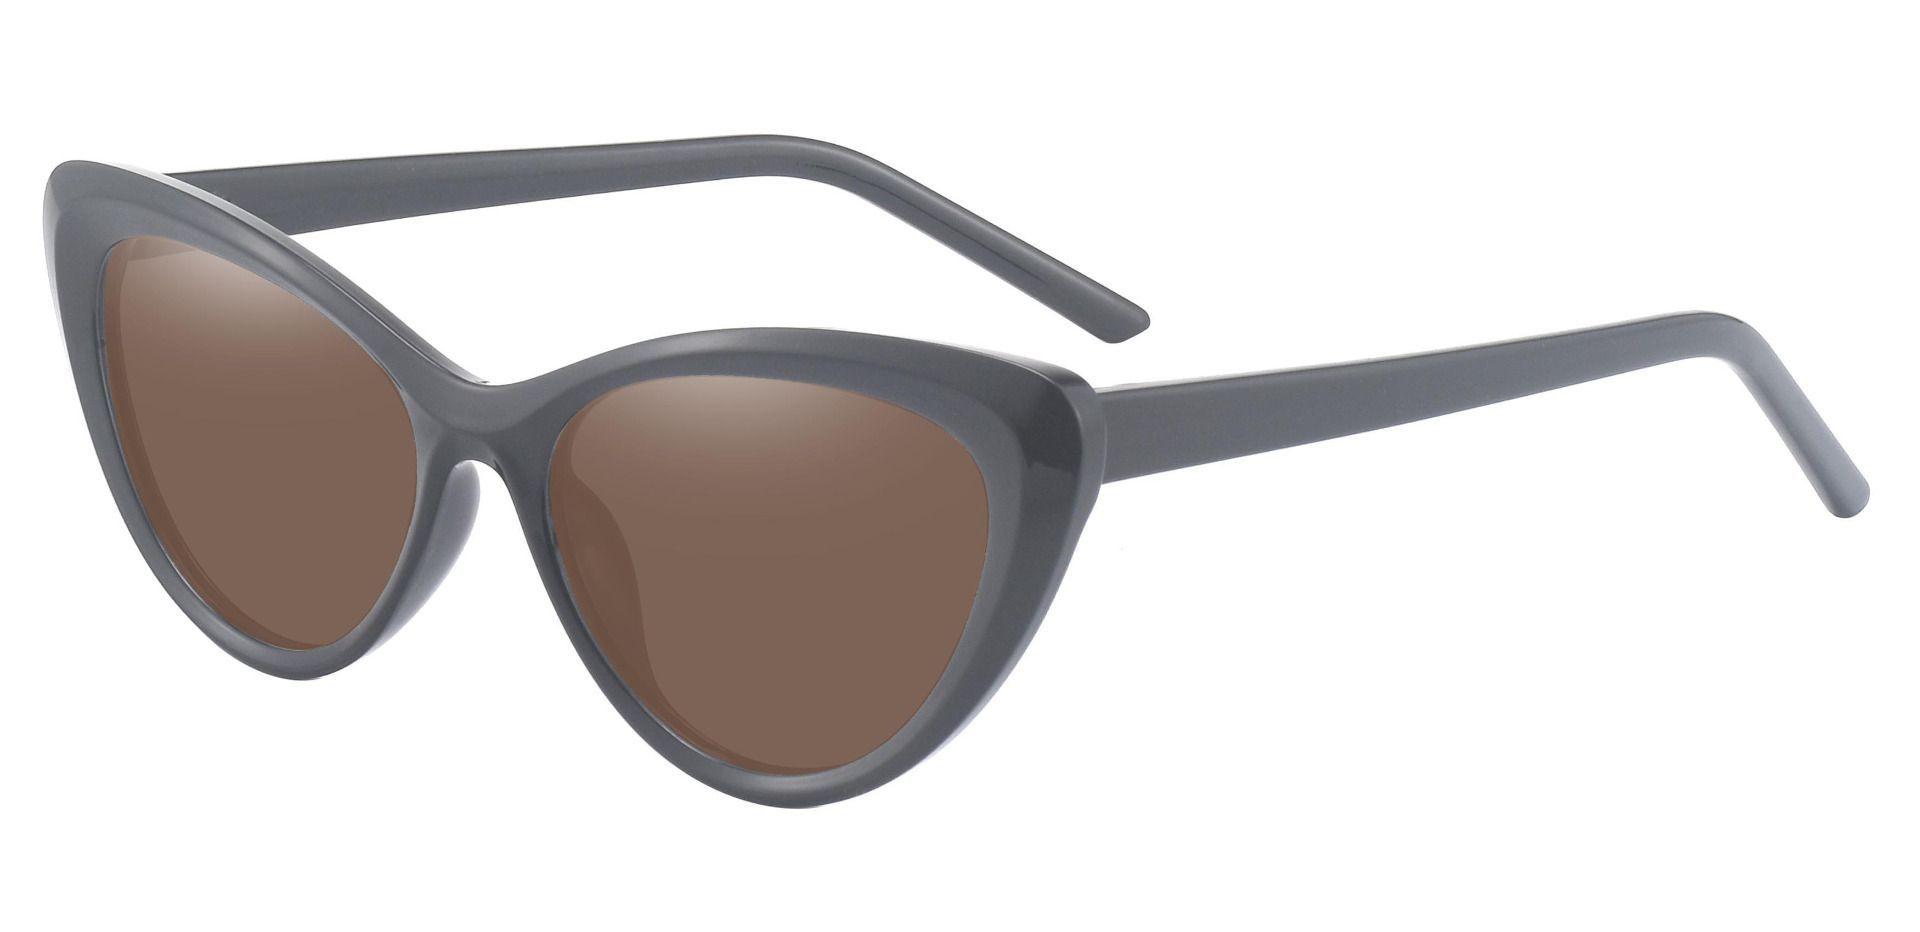 Gemini Cat Eye Prescription Sunglasses - Black Frame With Brown Lenses